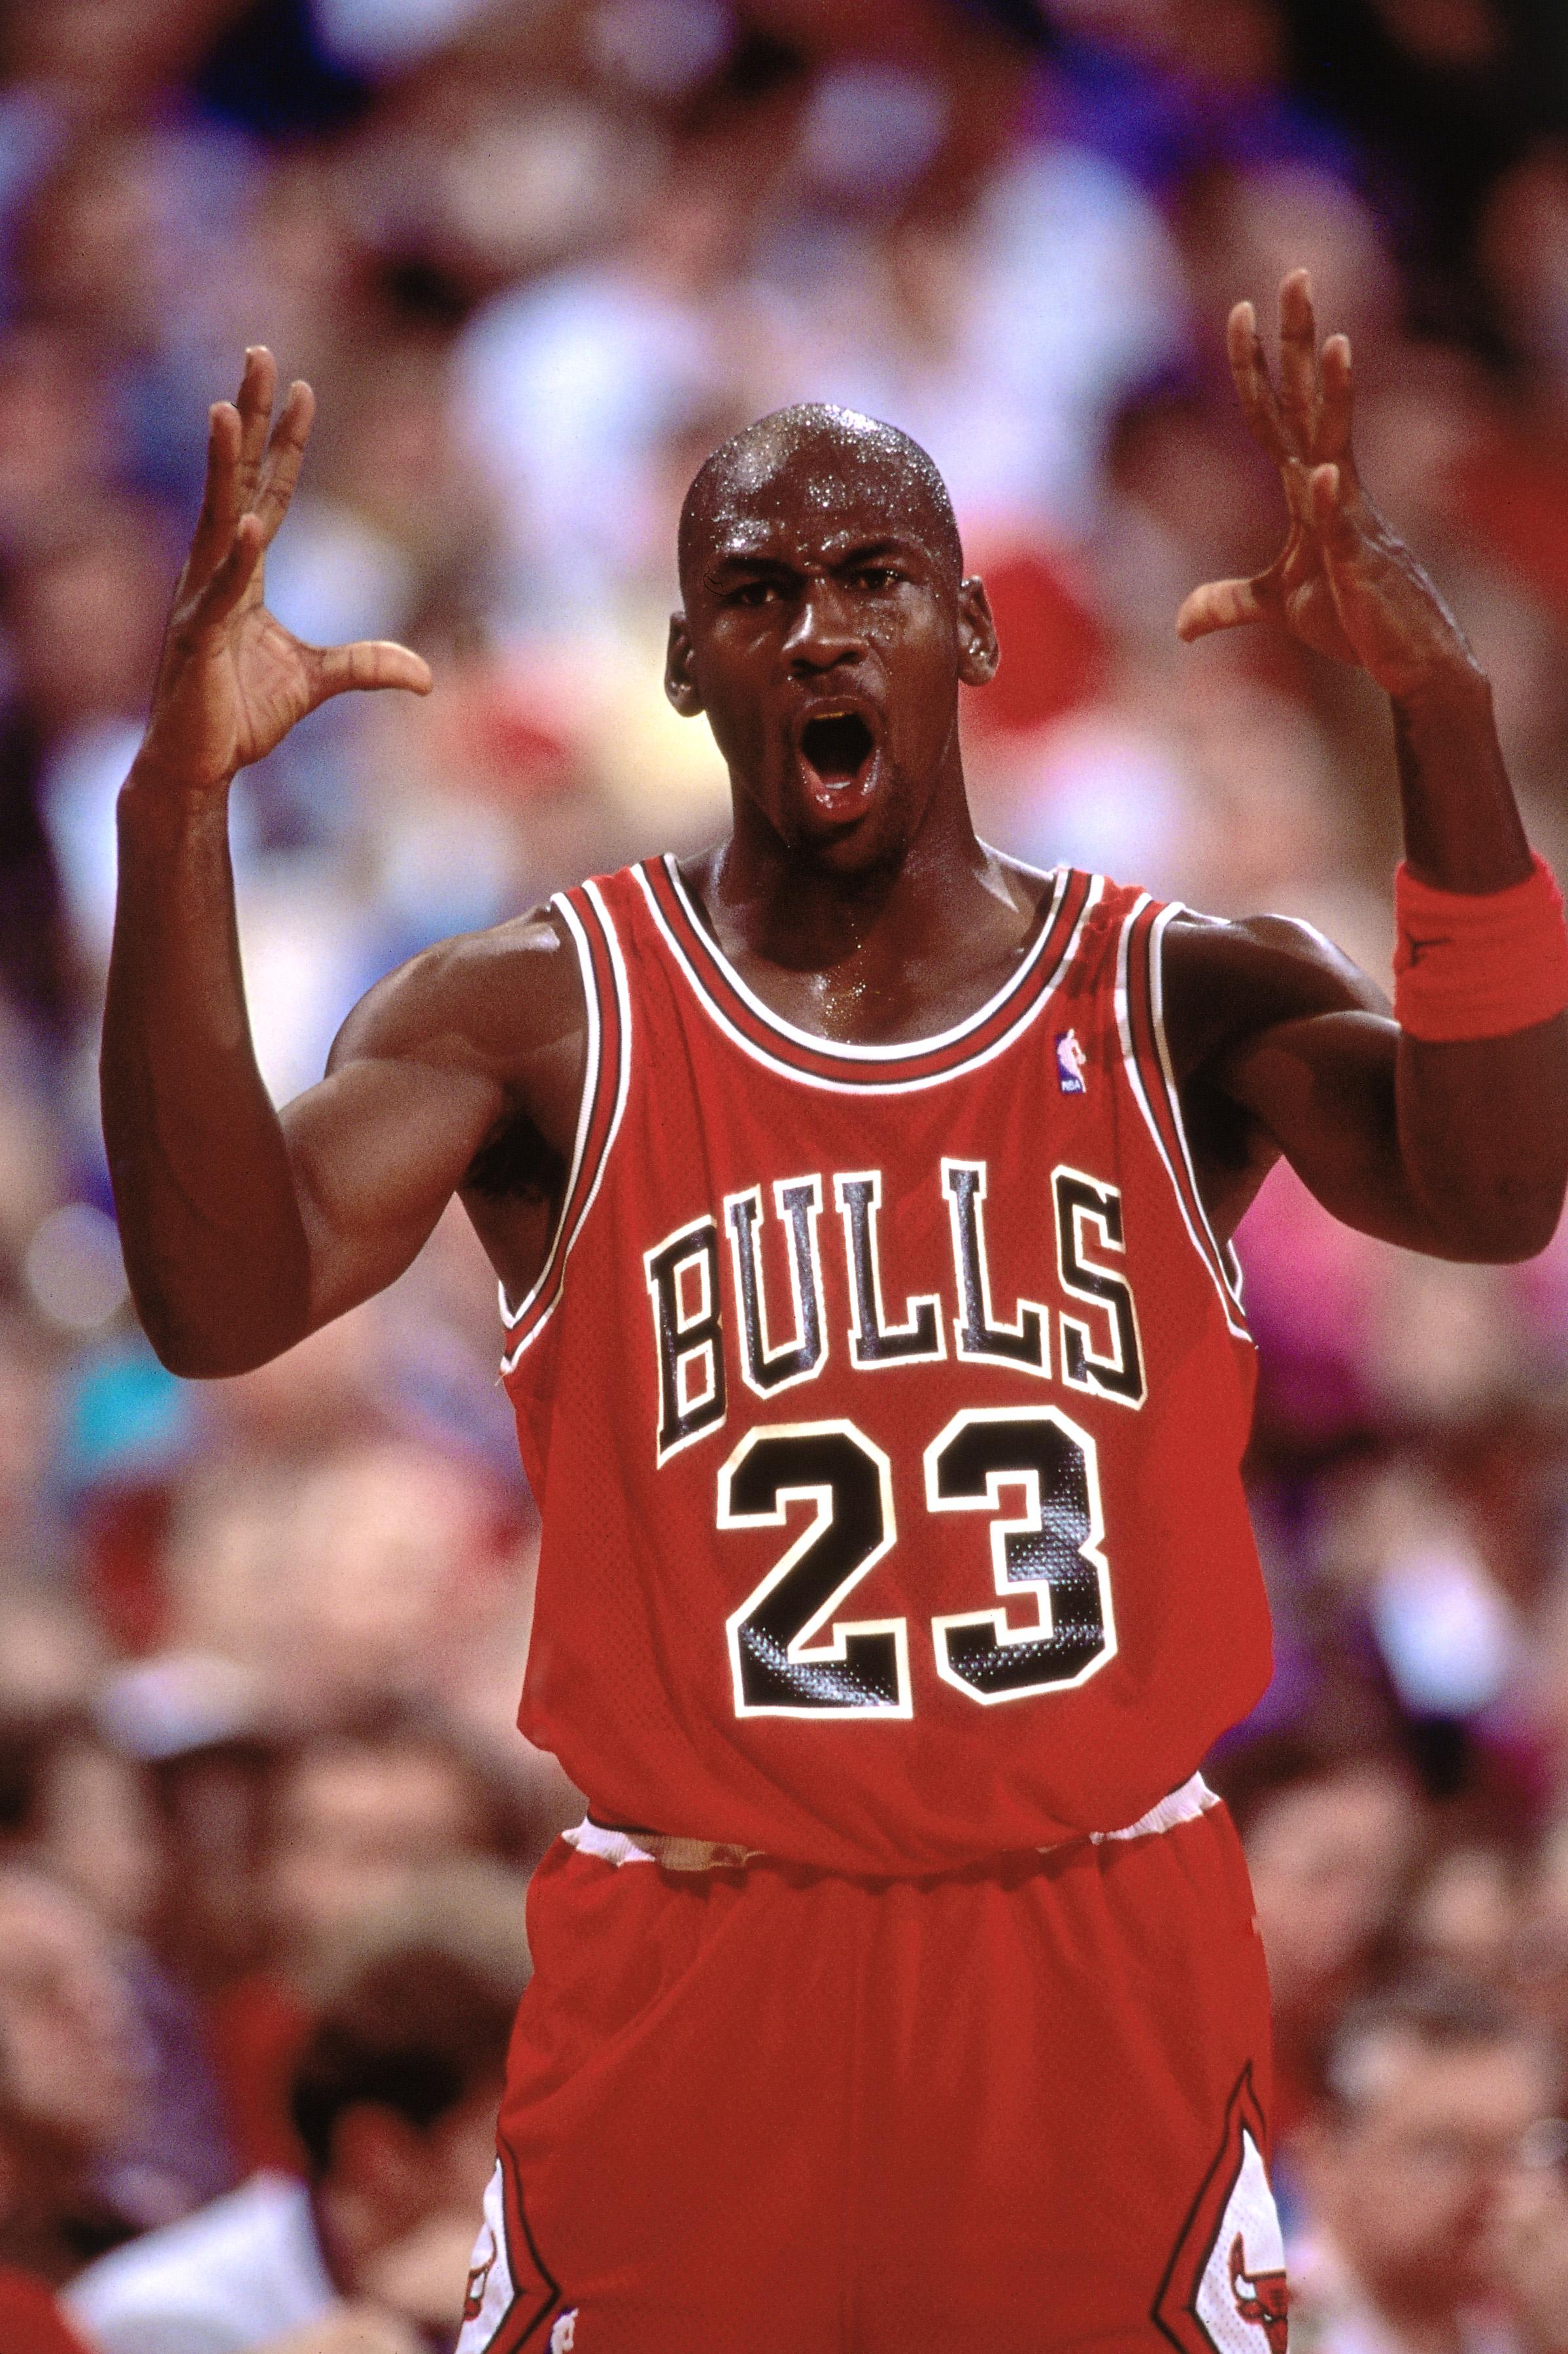 Another Michael Jordan